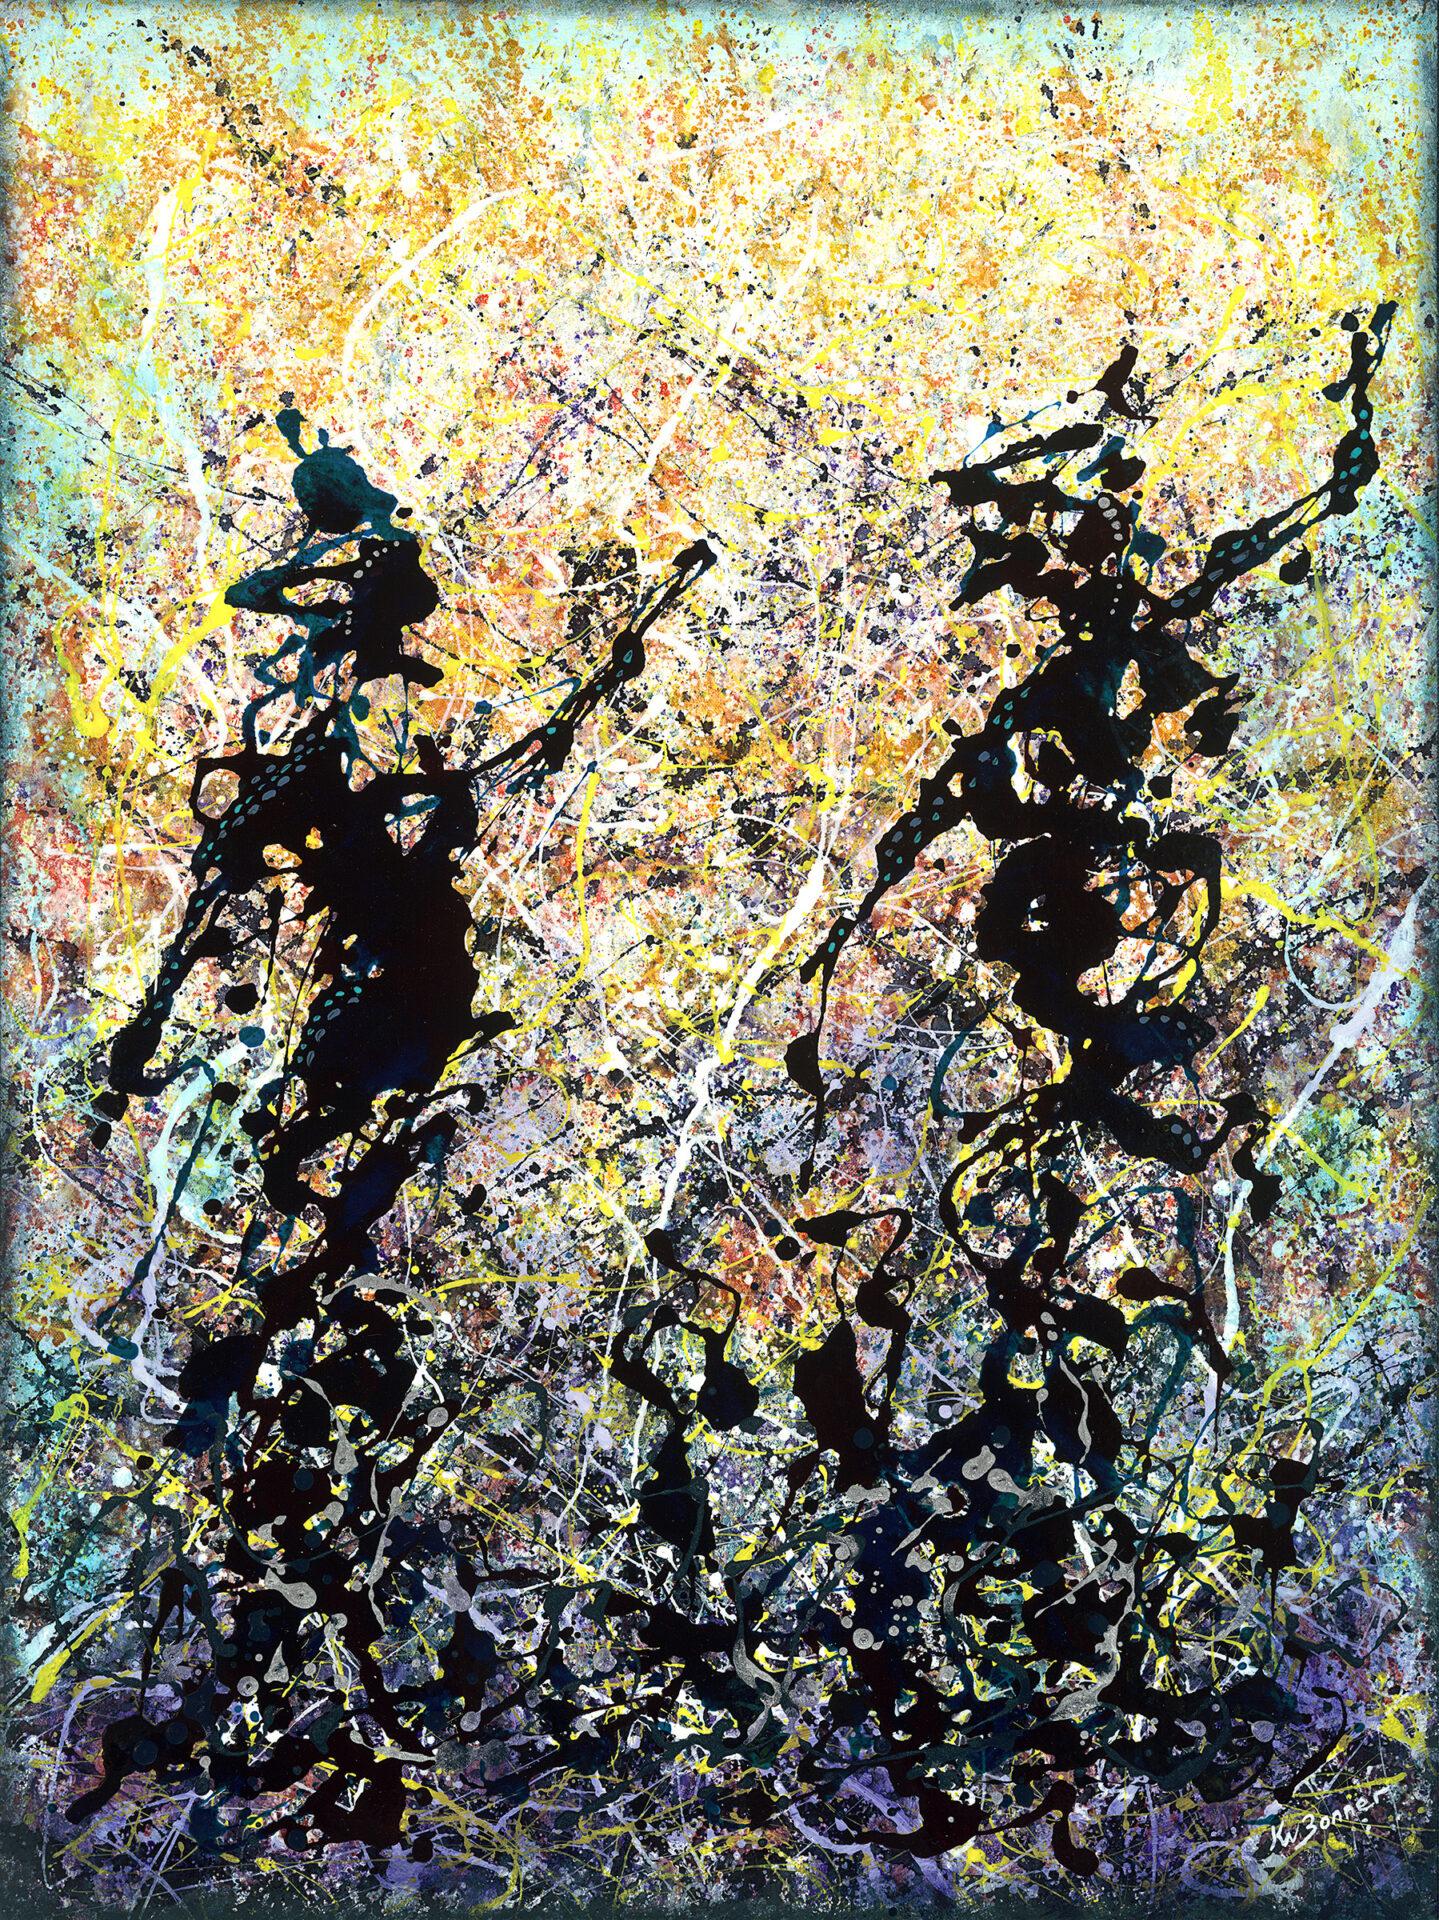 Do you wanna dance | Indigenous dance | Ken Bonner original oil | Santa Fe New Mexico   us